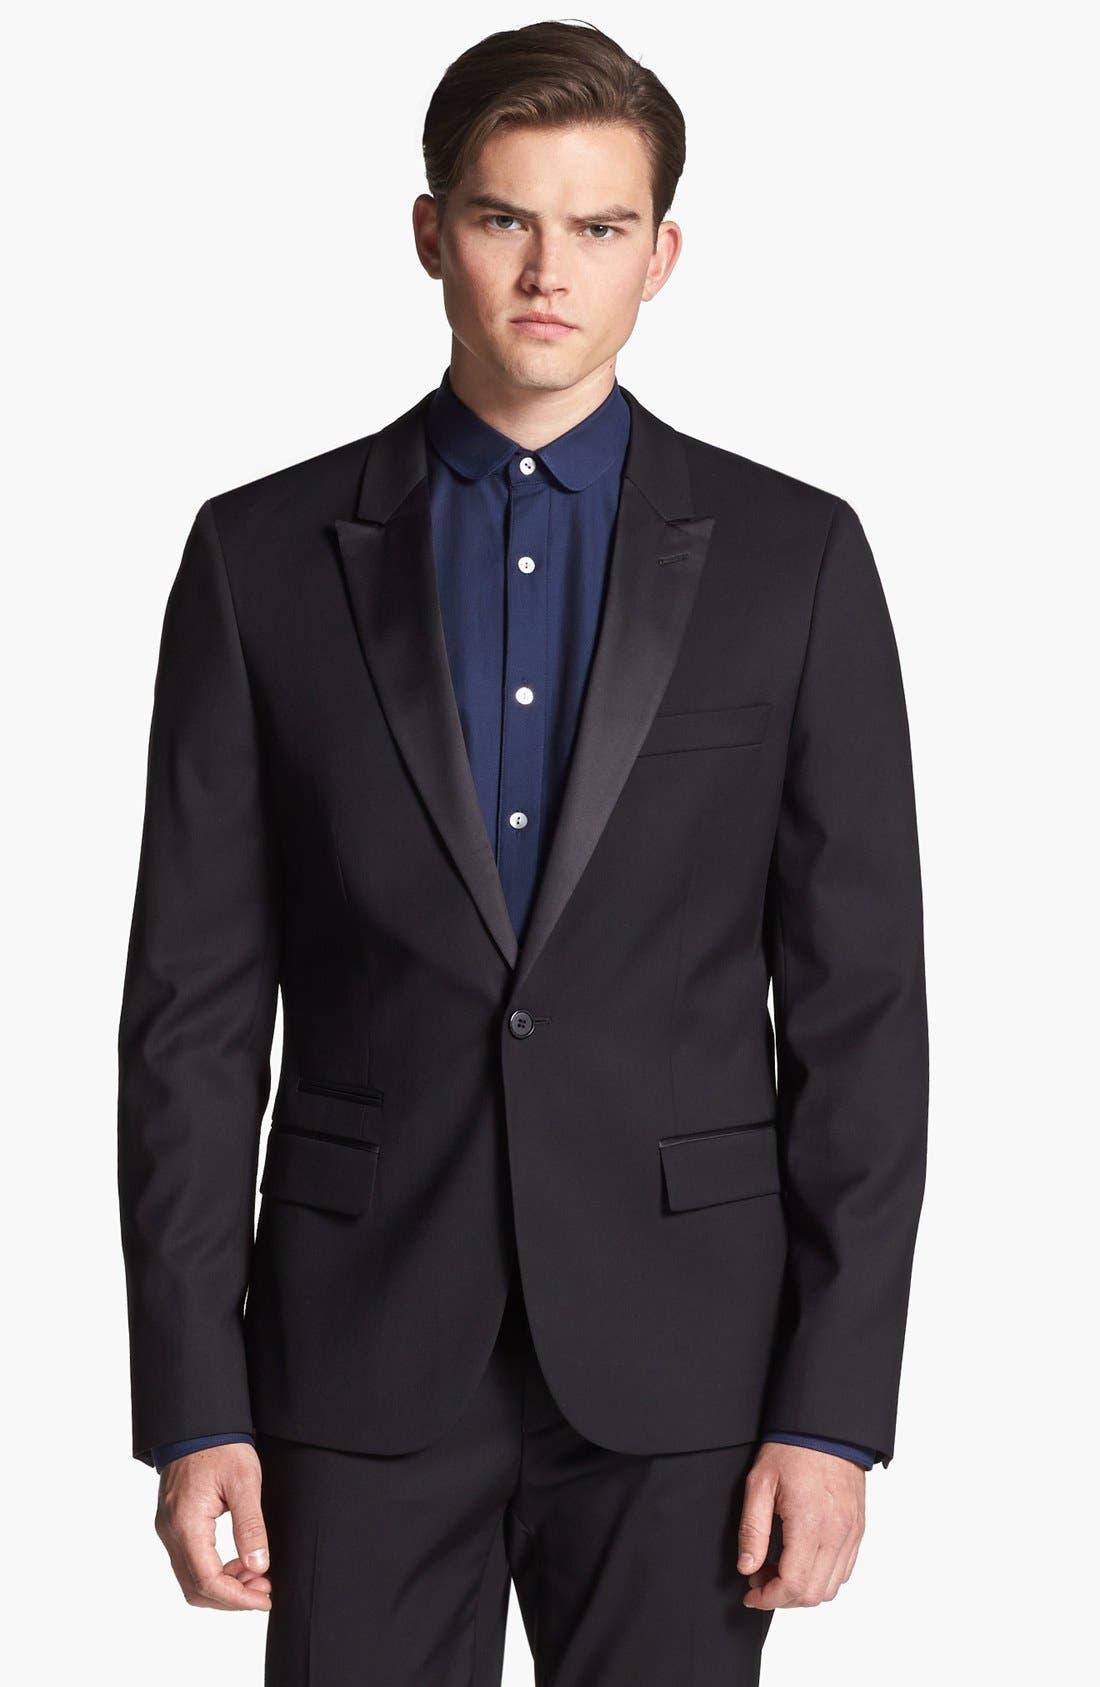 Alternate Image 1 Selected - Topman Slim Fit Tuxedo Jacket